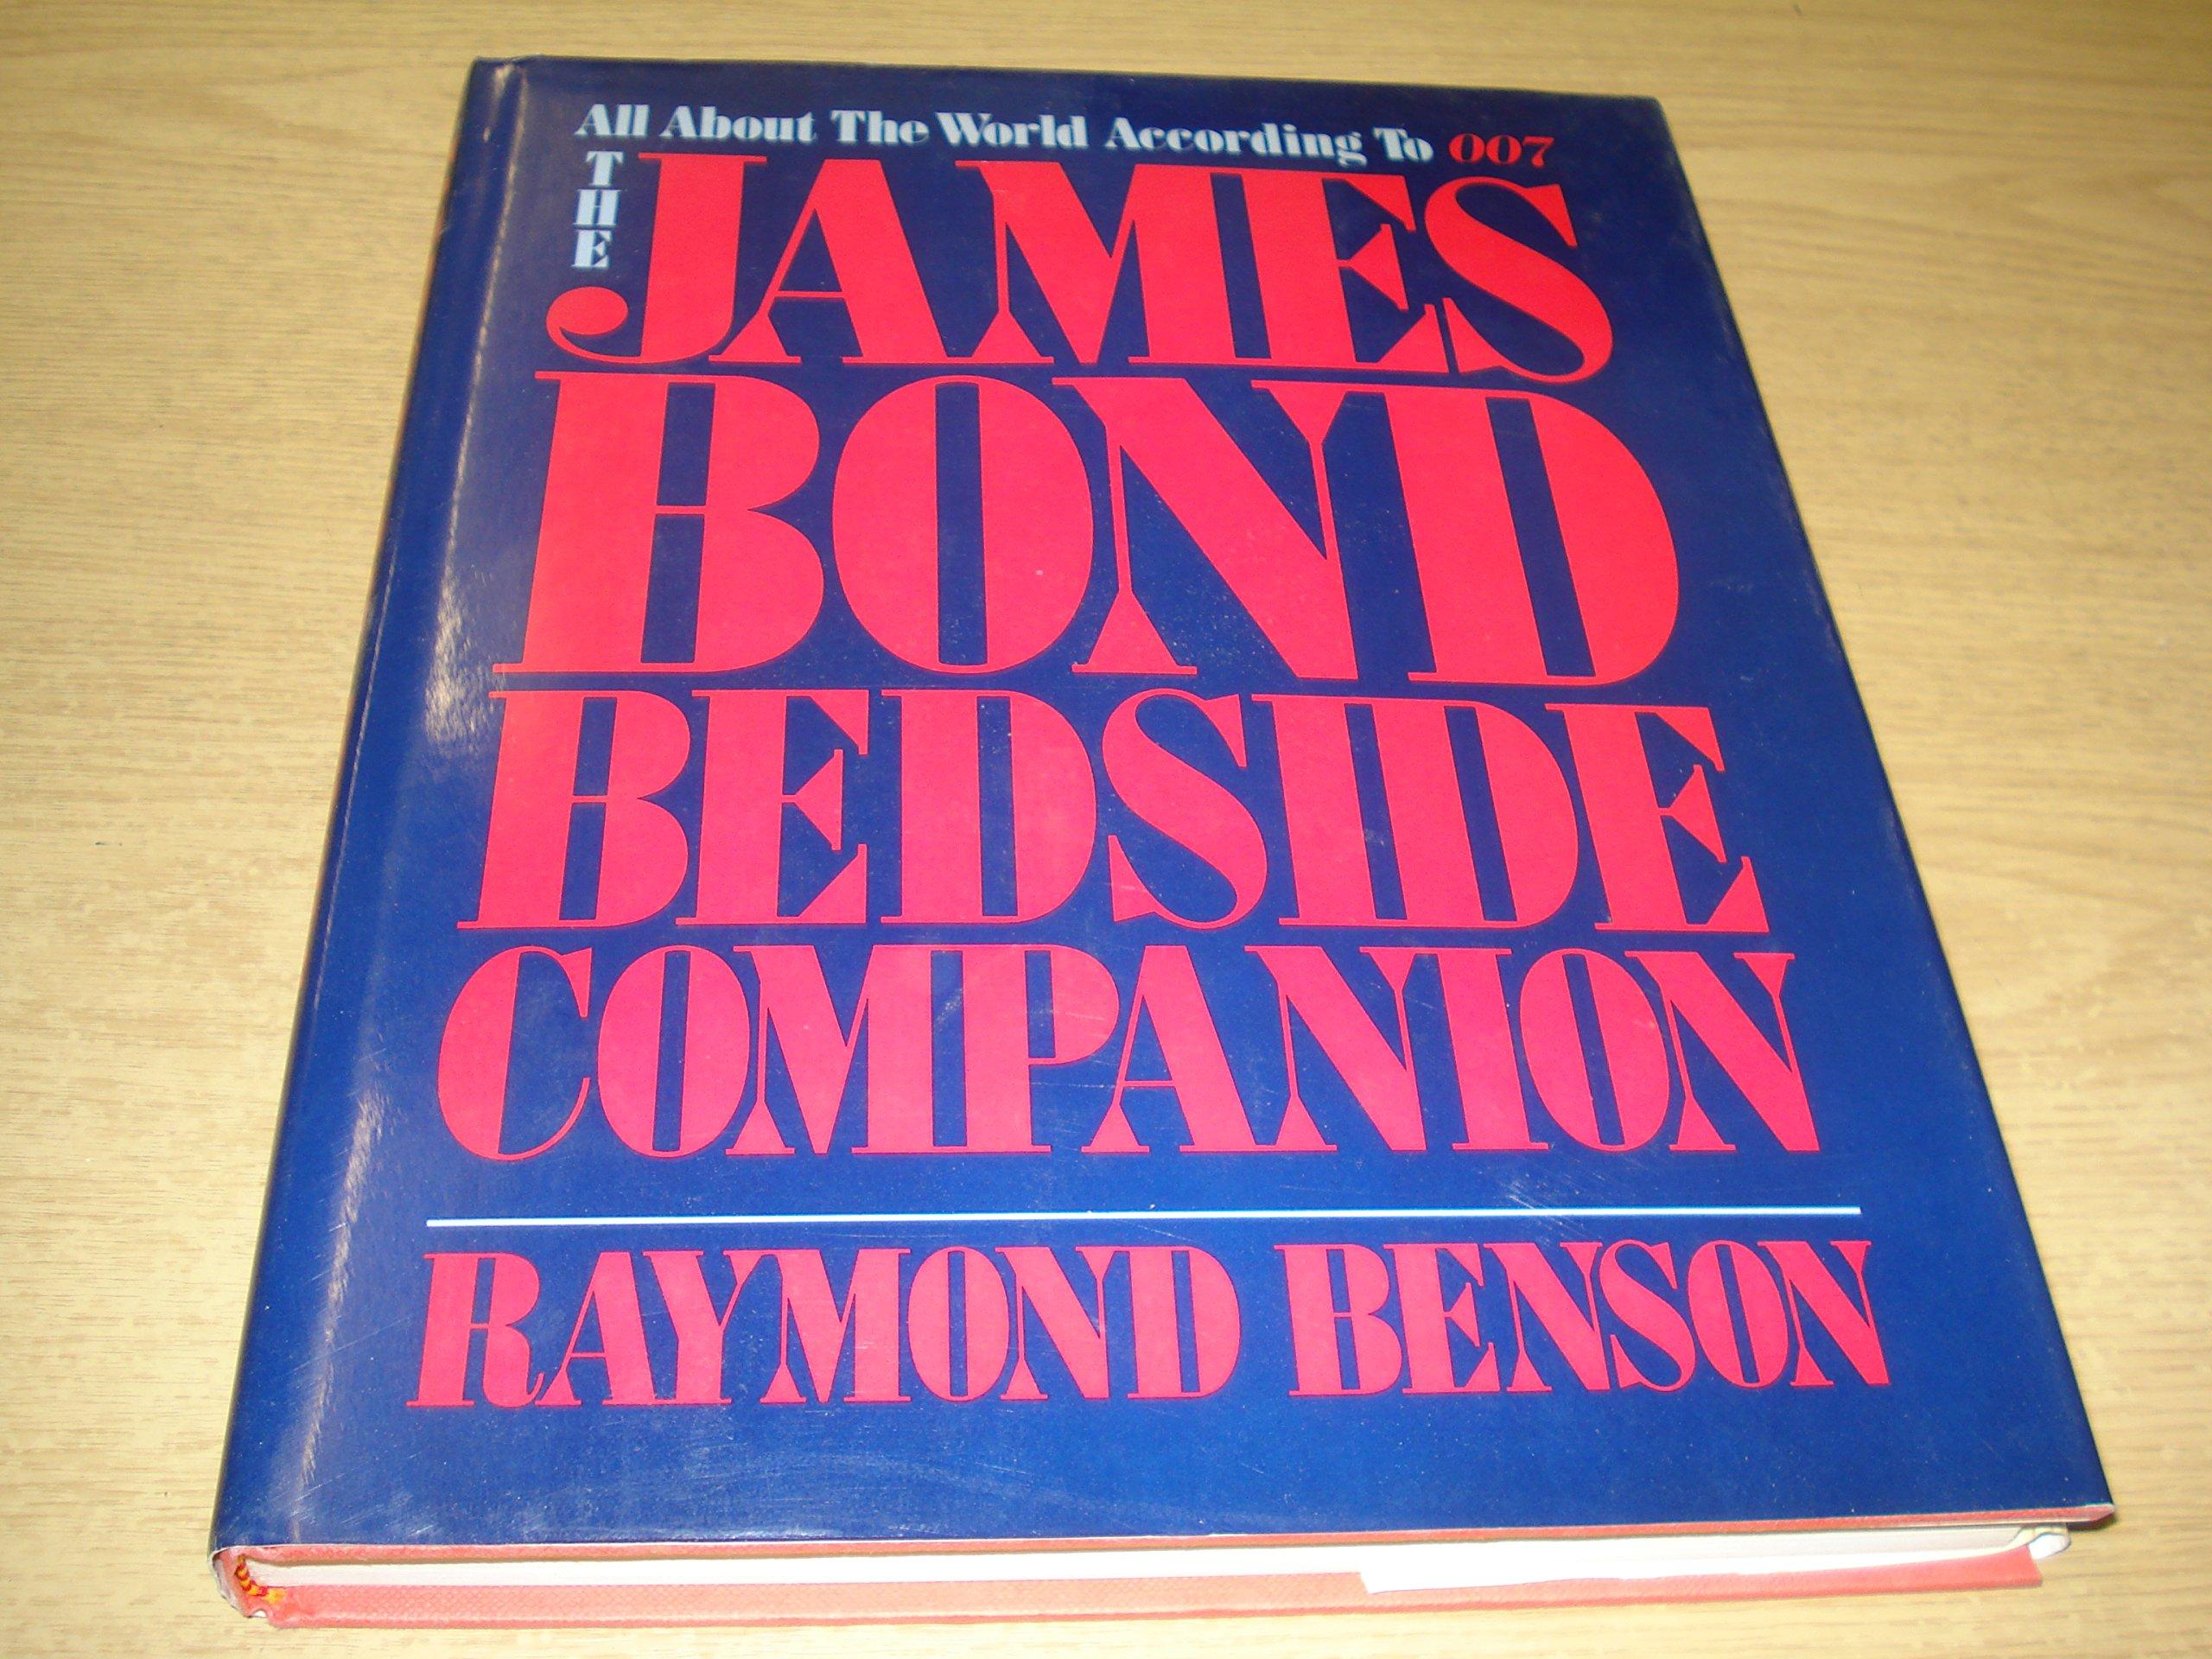 THE JAMES BOND BEDSIDE COMPANION. (SIGNED).: Amazon.co.uk: Raymond. Benson:  9780883657058: Books